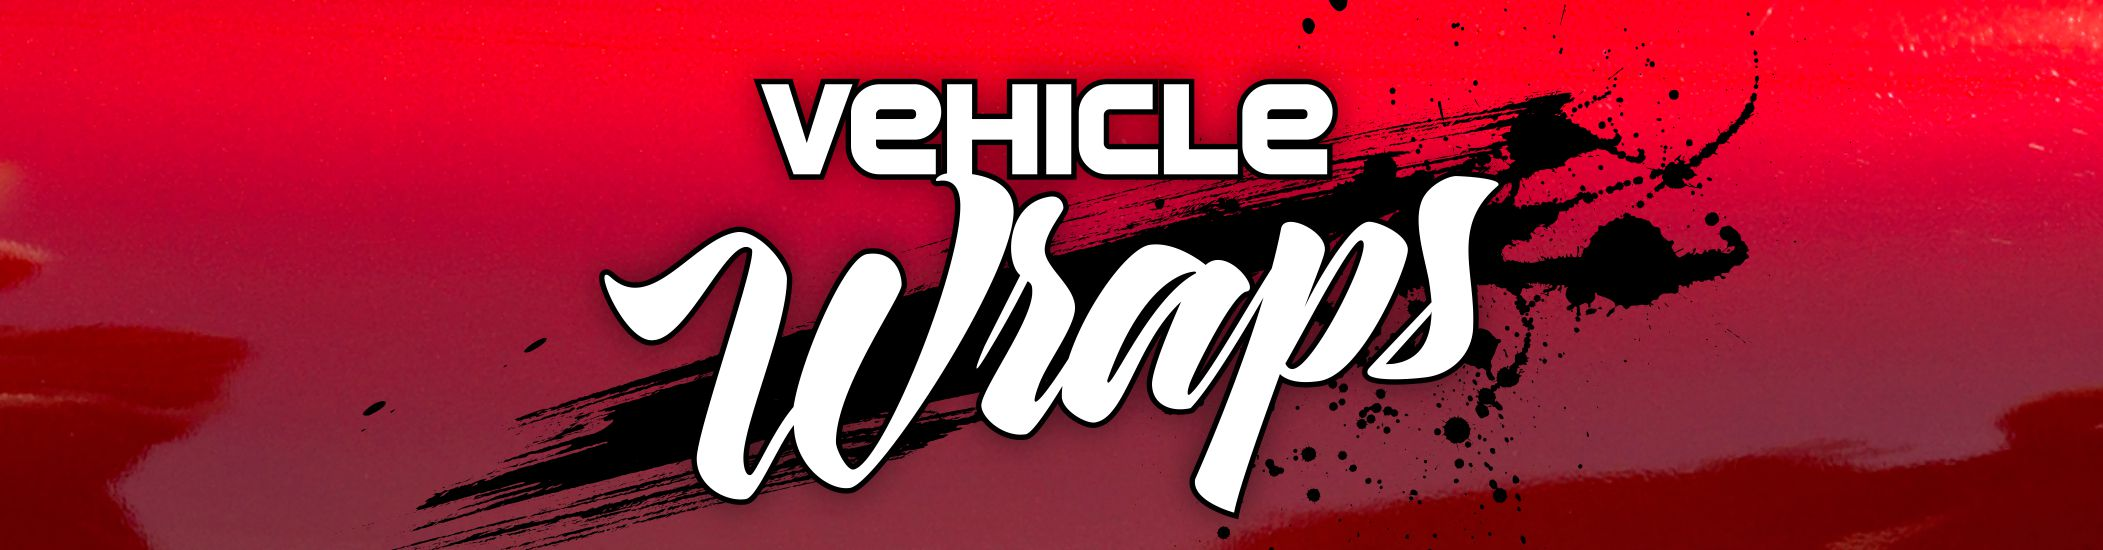 vehicle-graphics-header